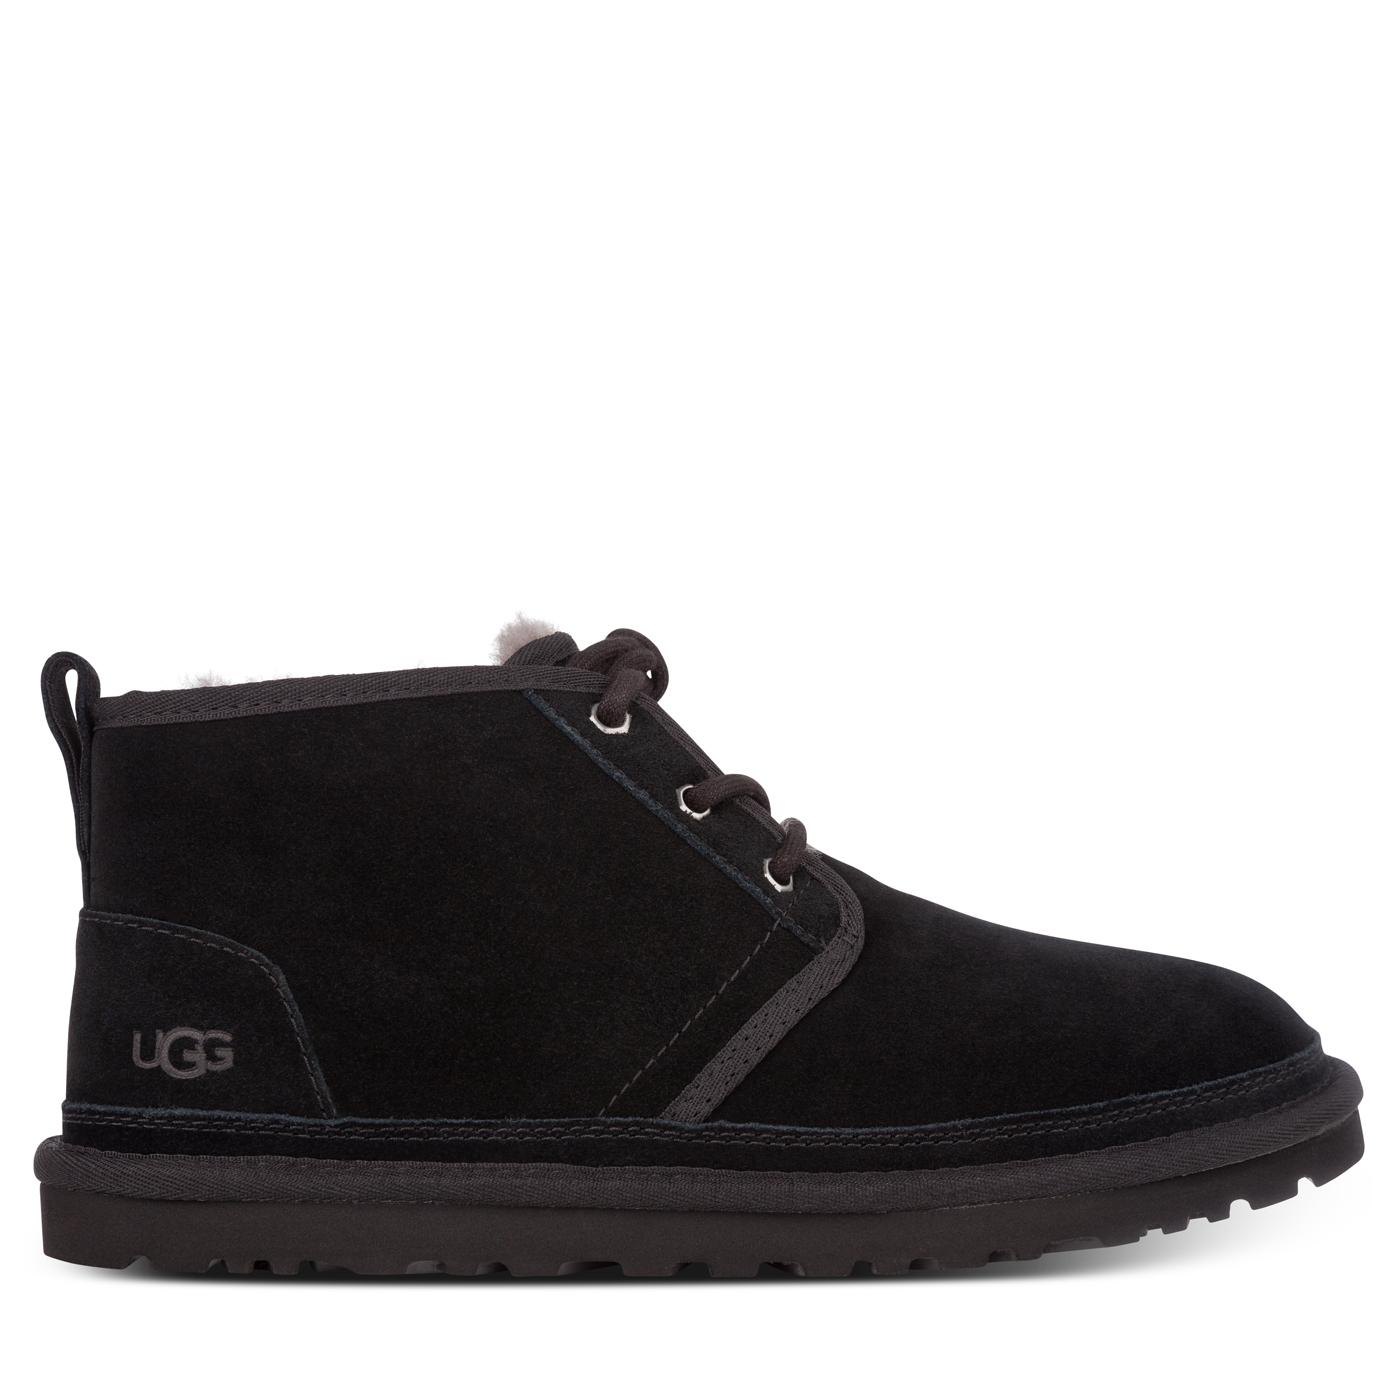 Ugg Black Neumel Boots - Size 9